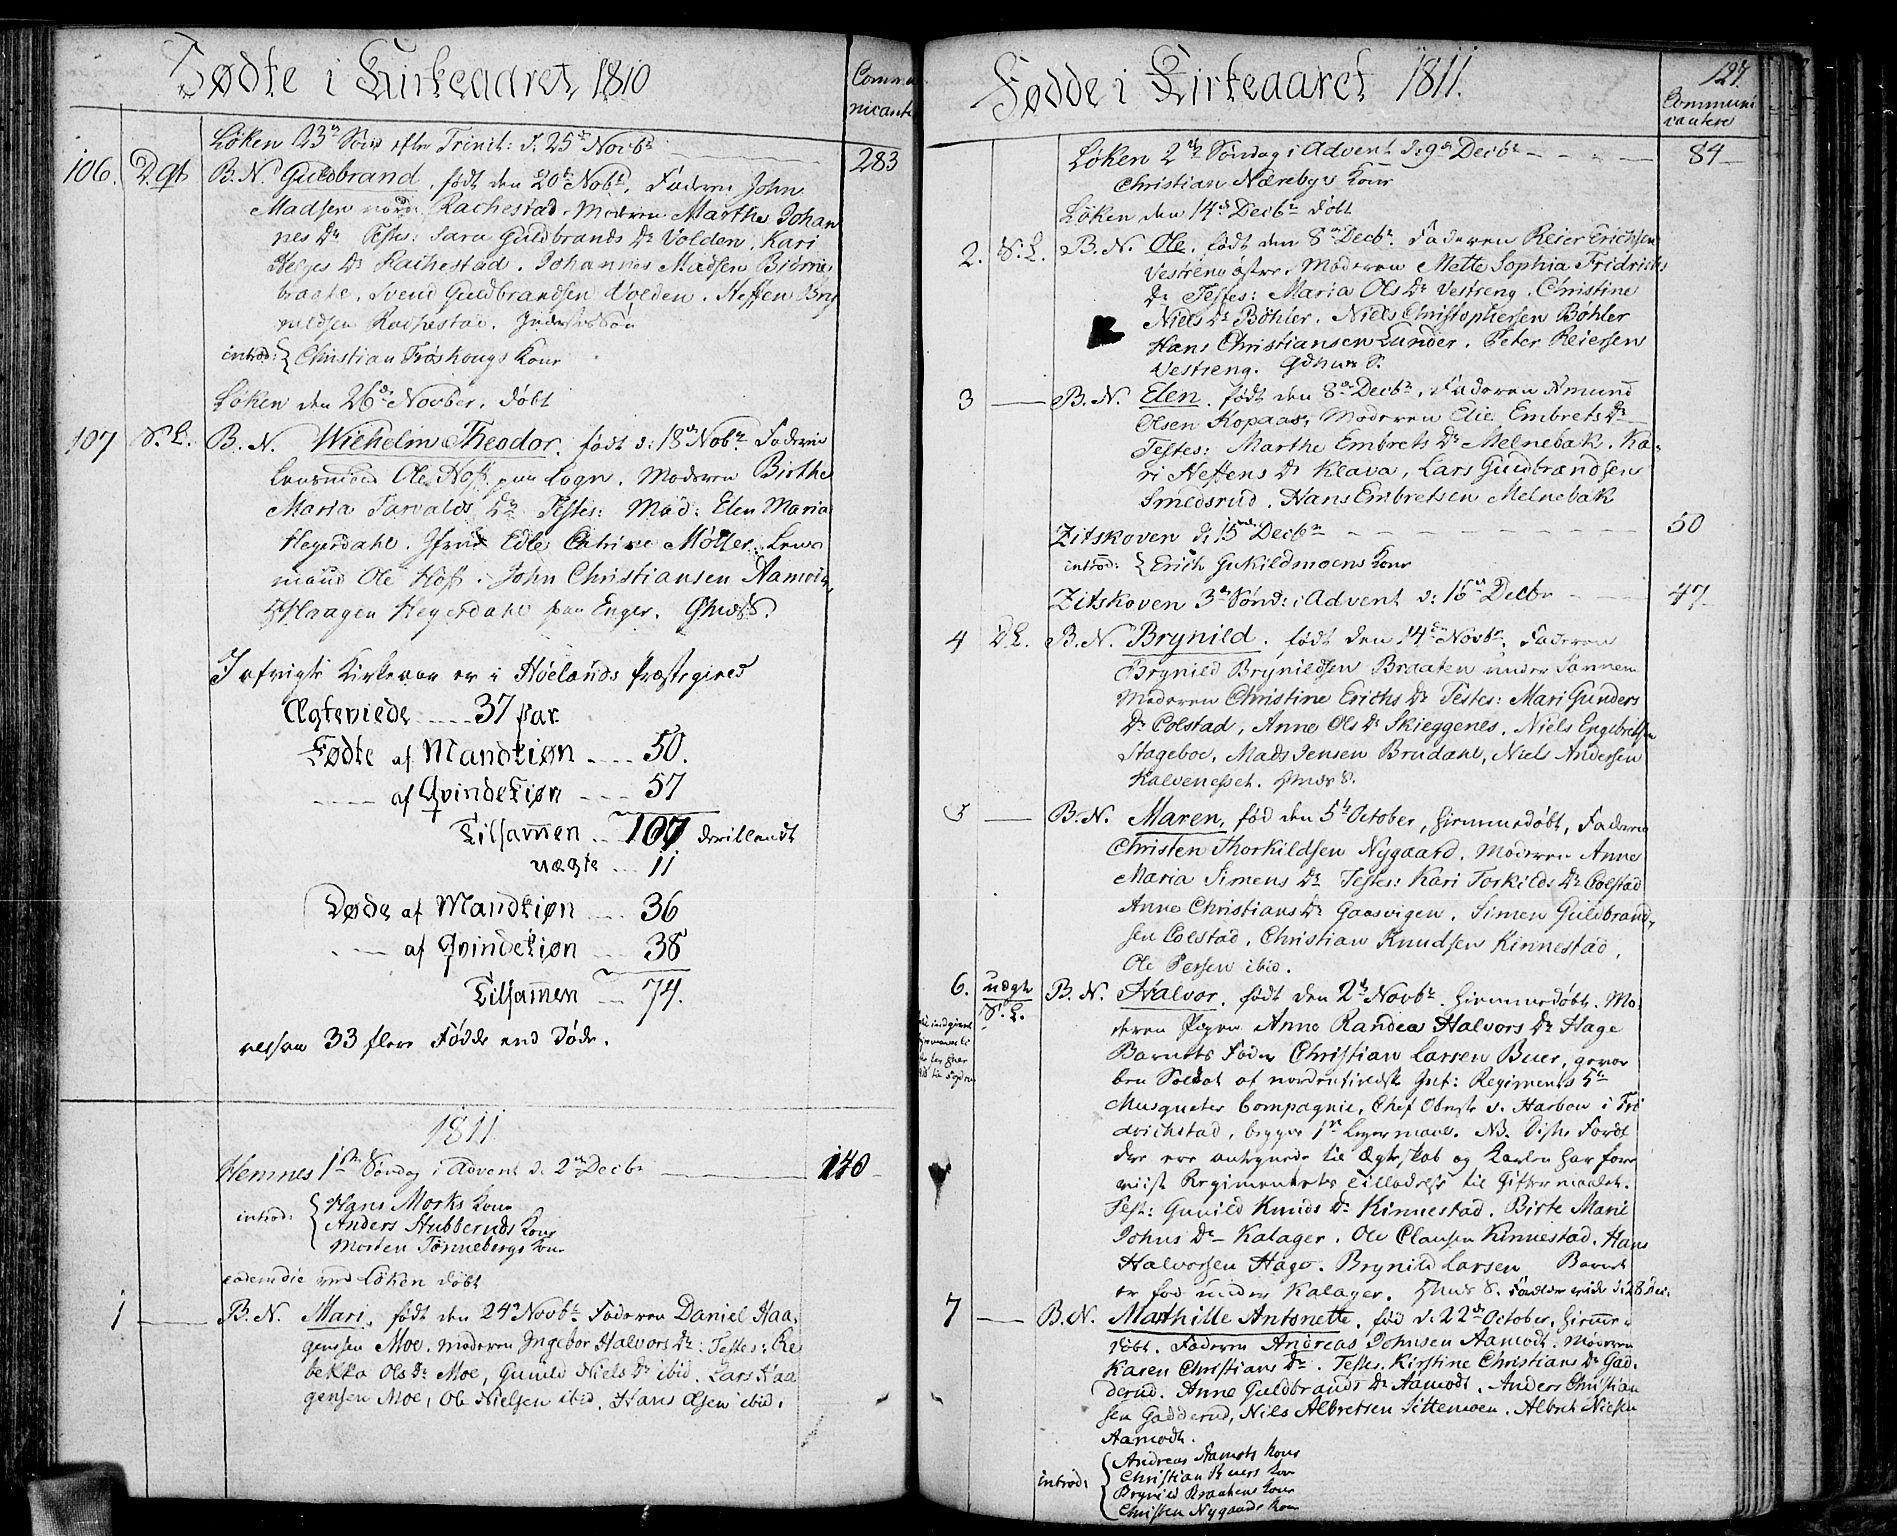 SAO, Høland prestekontor Kirkebøker, F/Fa/L0006: Ministerialbok nr. I 6, 1794-1814, s. 127